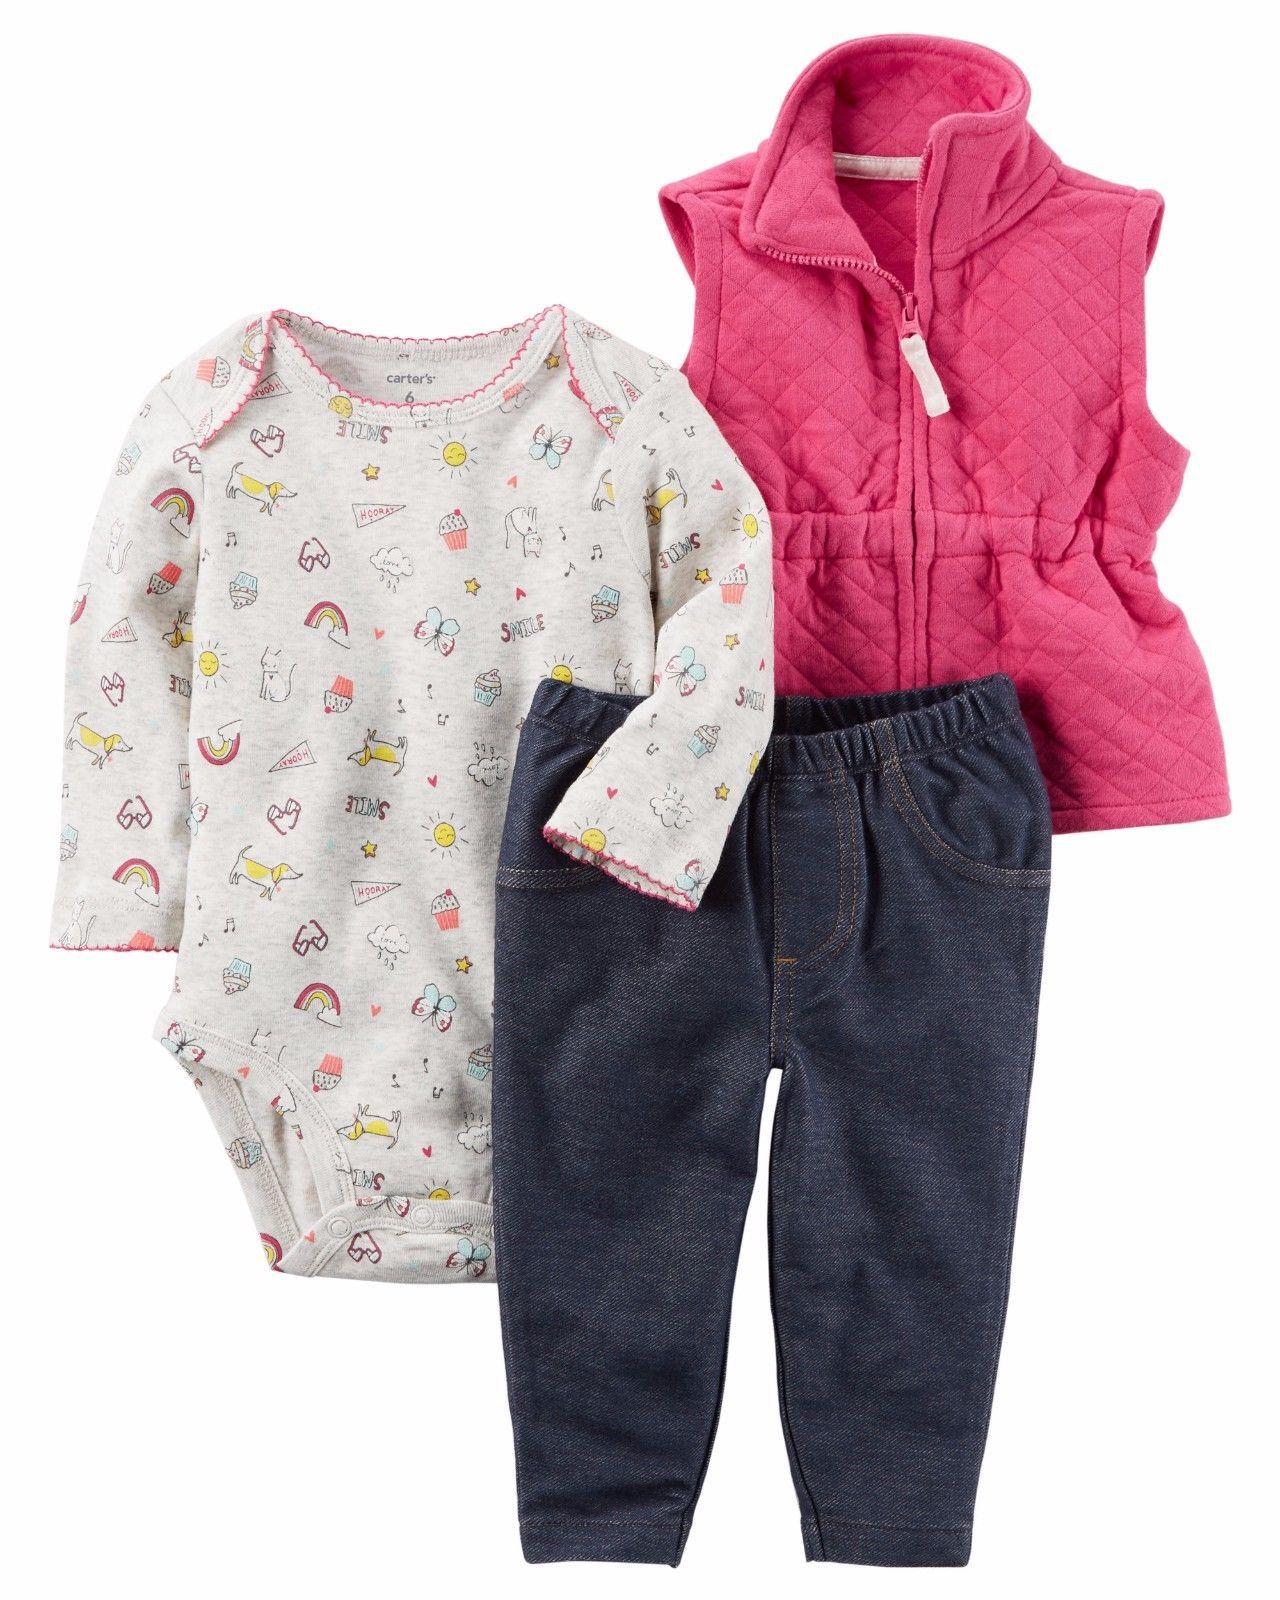 444391fc3 NEW NWT Carter's 3 Piece Vest Set Newborn 3 and 43 similar items